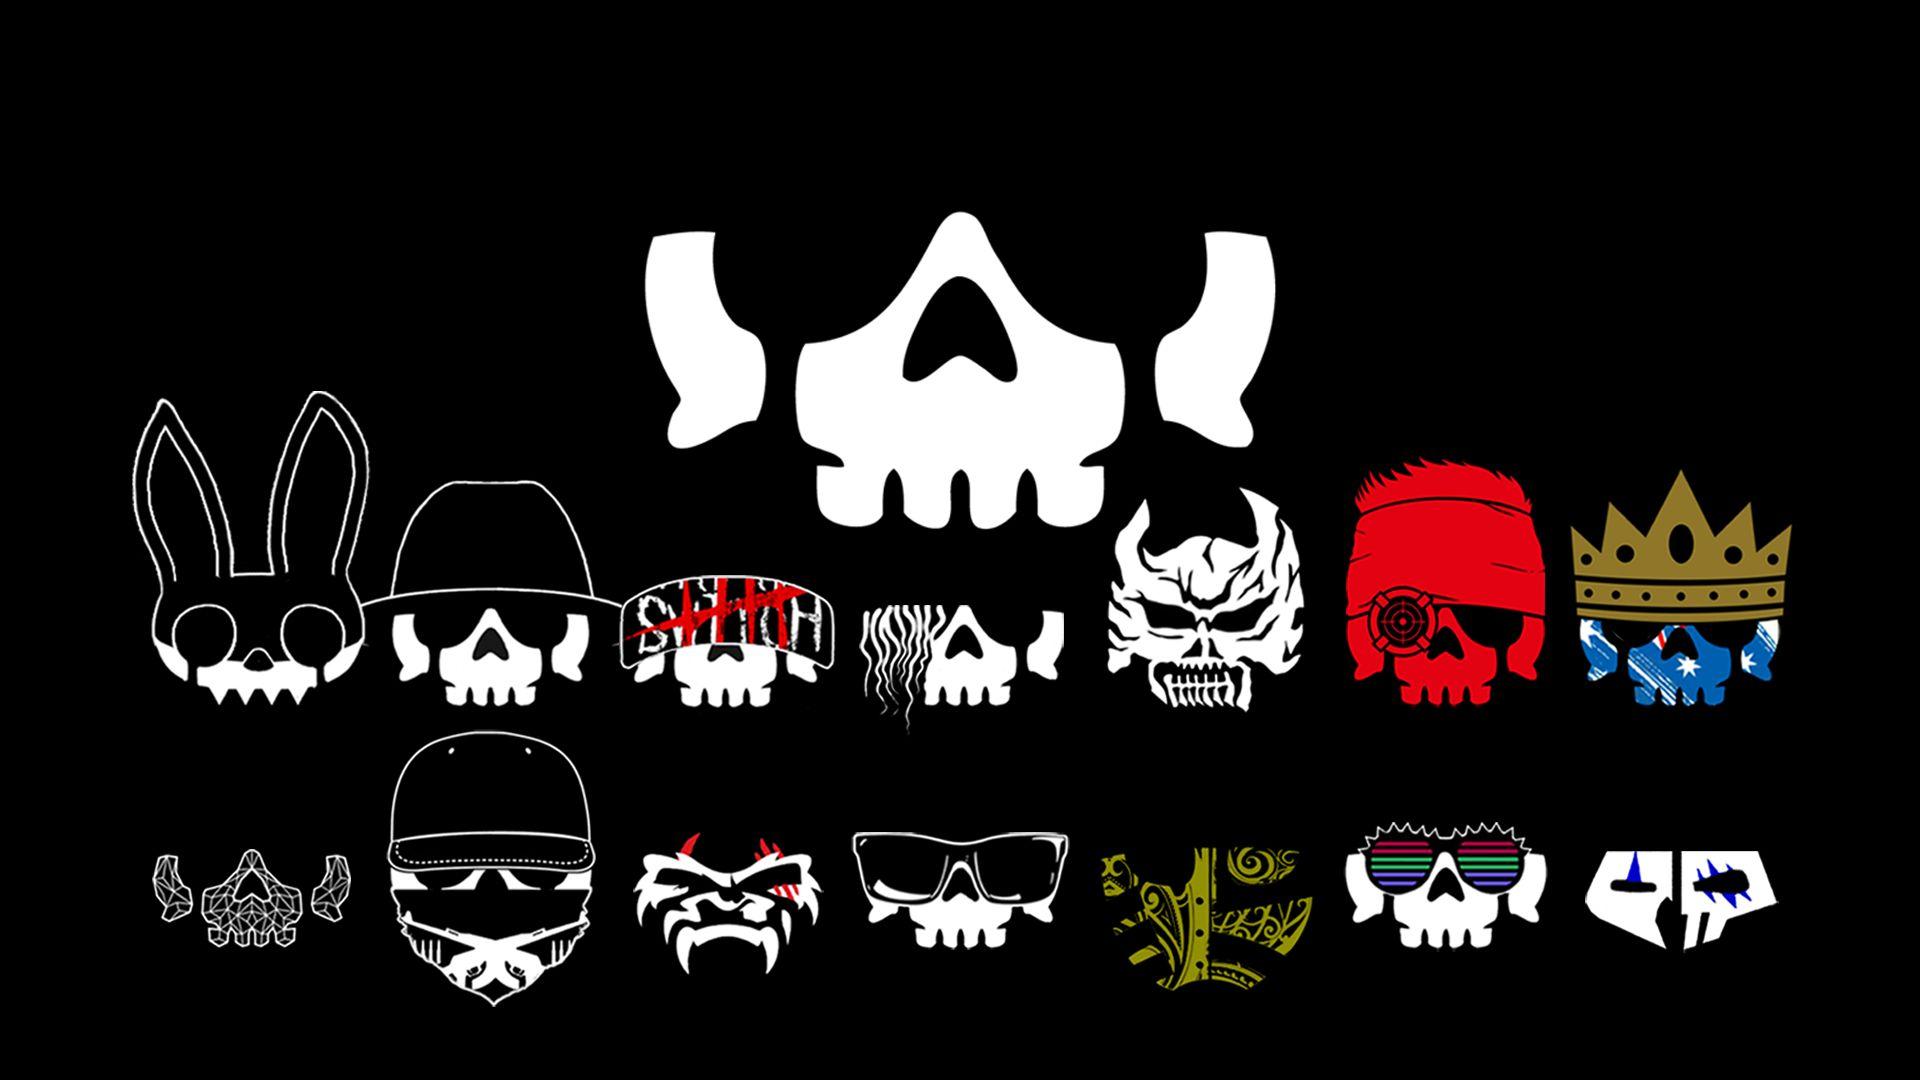 Bullet Club full hd 1080p wallpaper